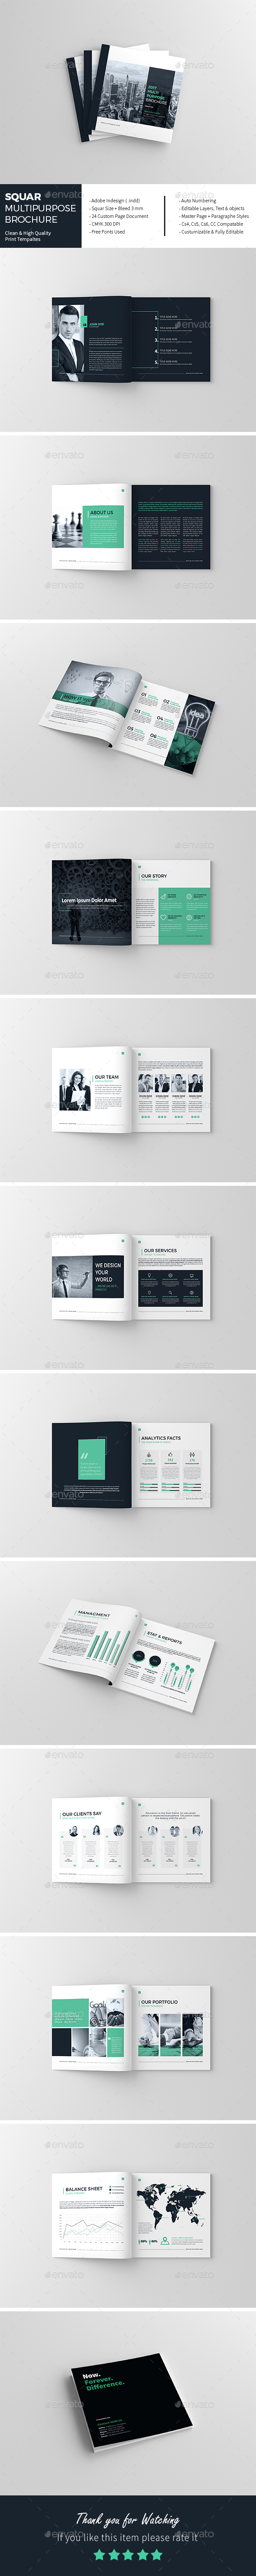 Squar Multi-Purpose Brochure - Corporate Brochures